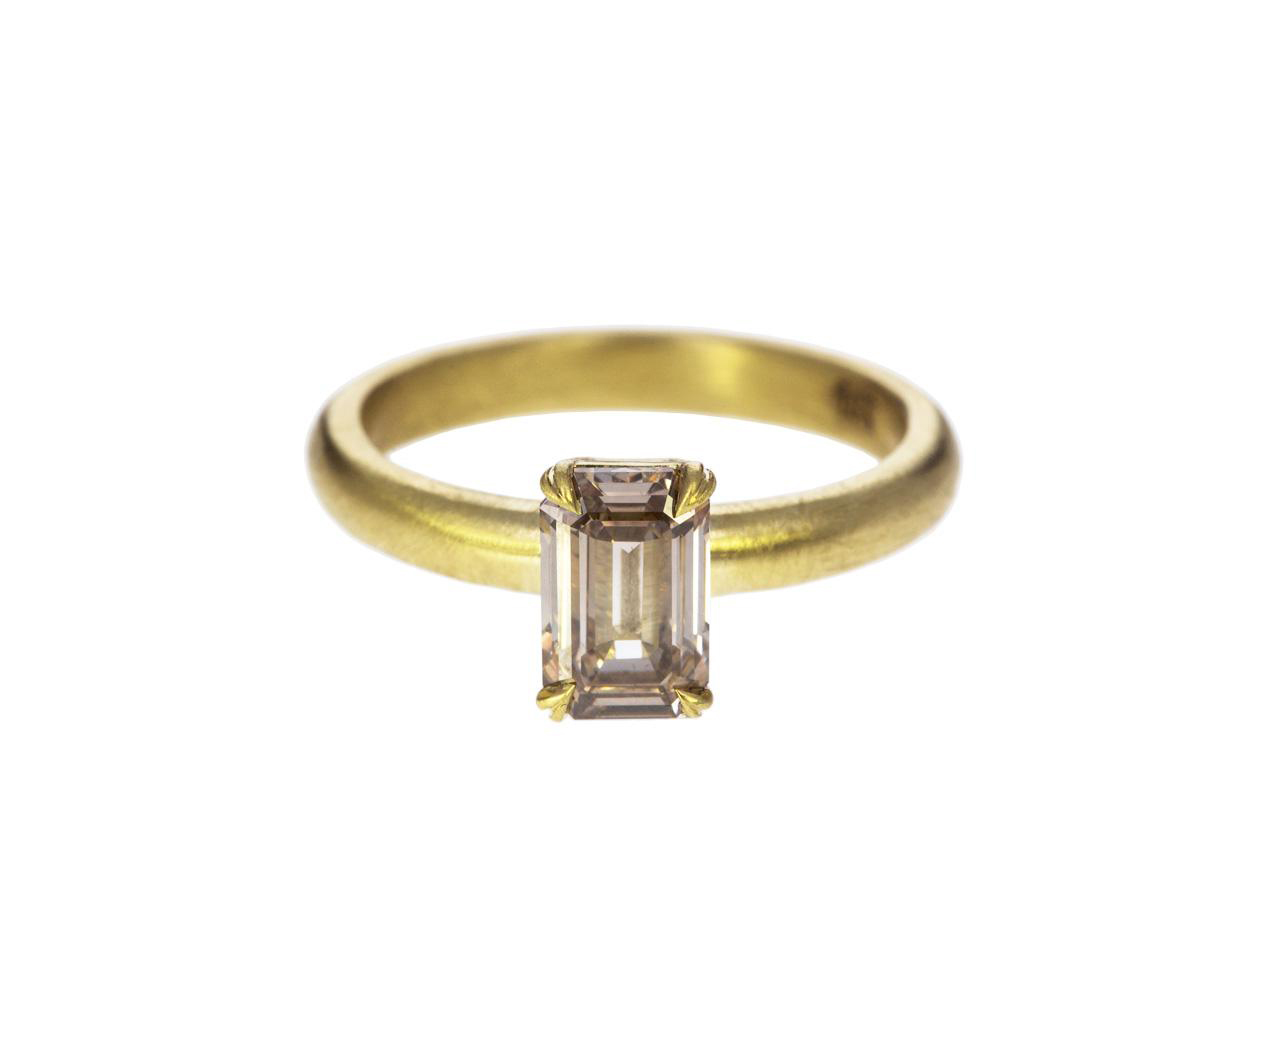 emerald cut ring matte yellow gold band